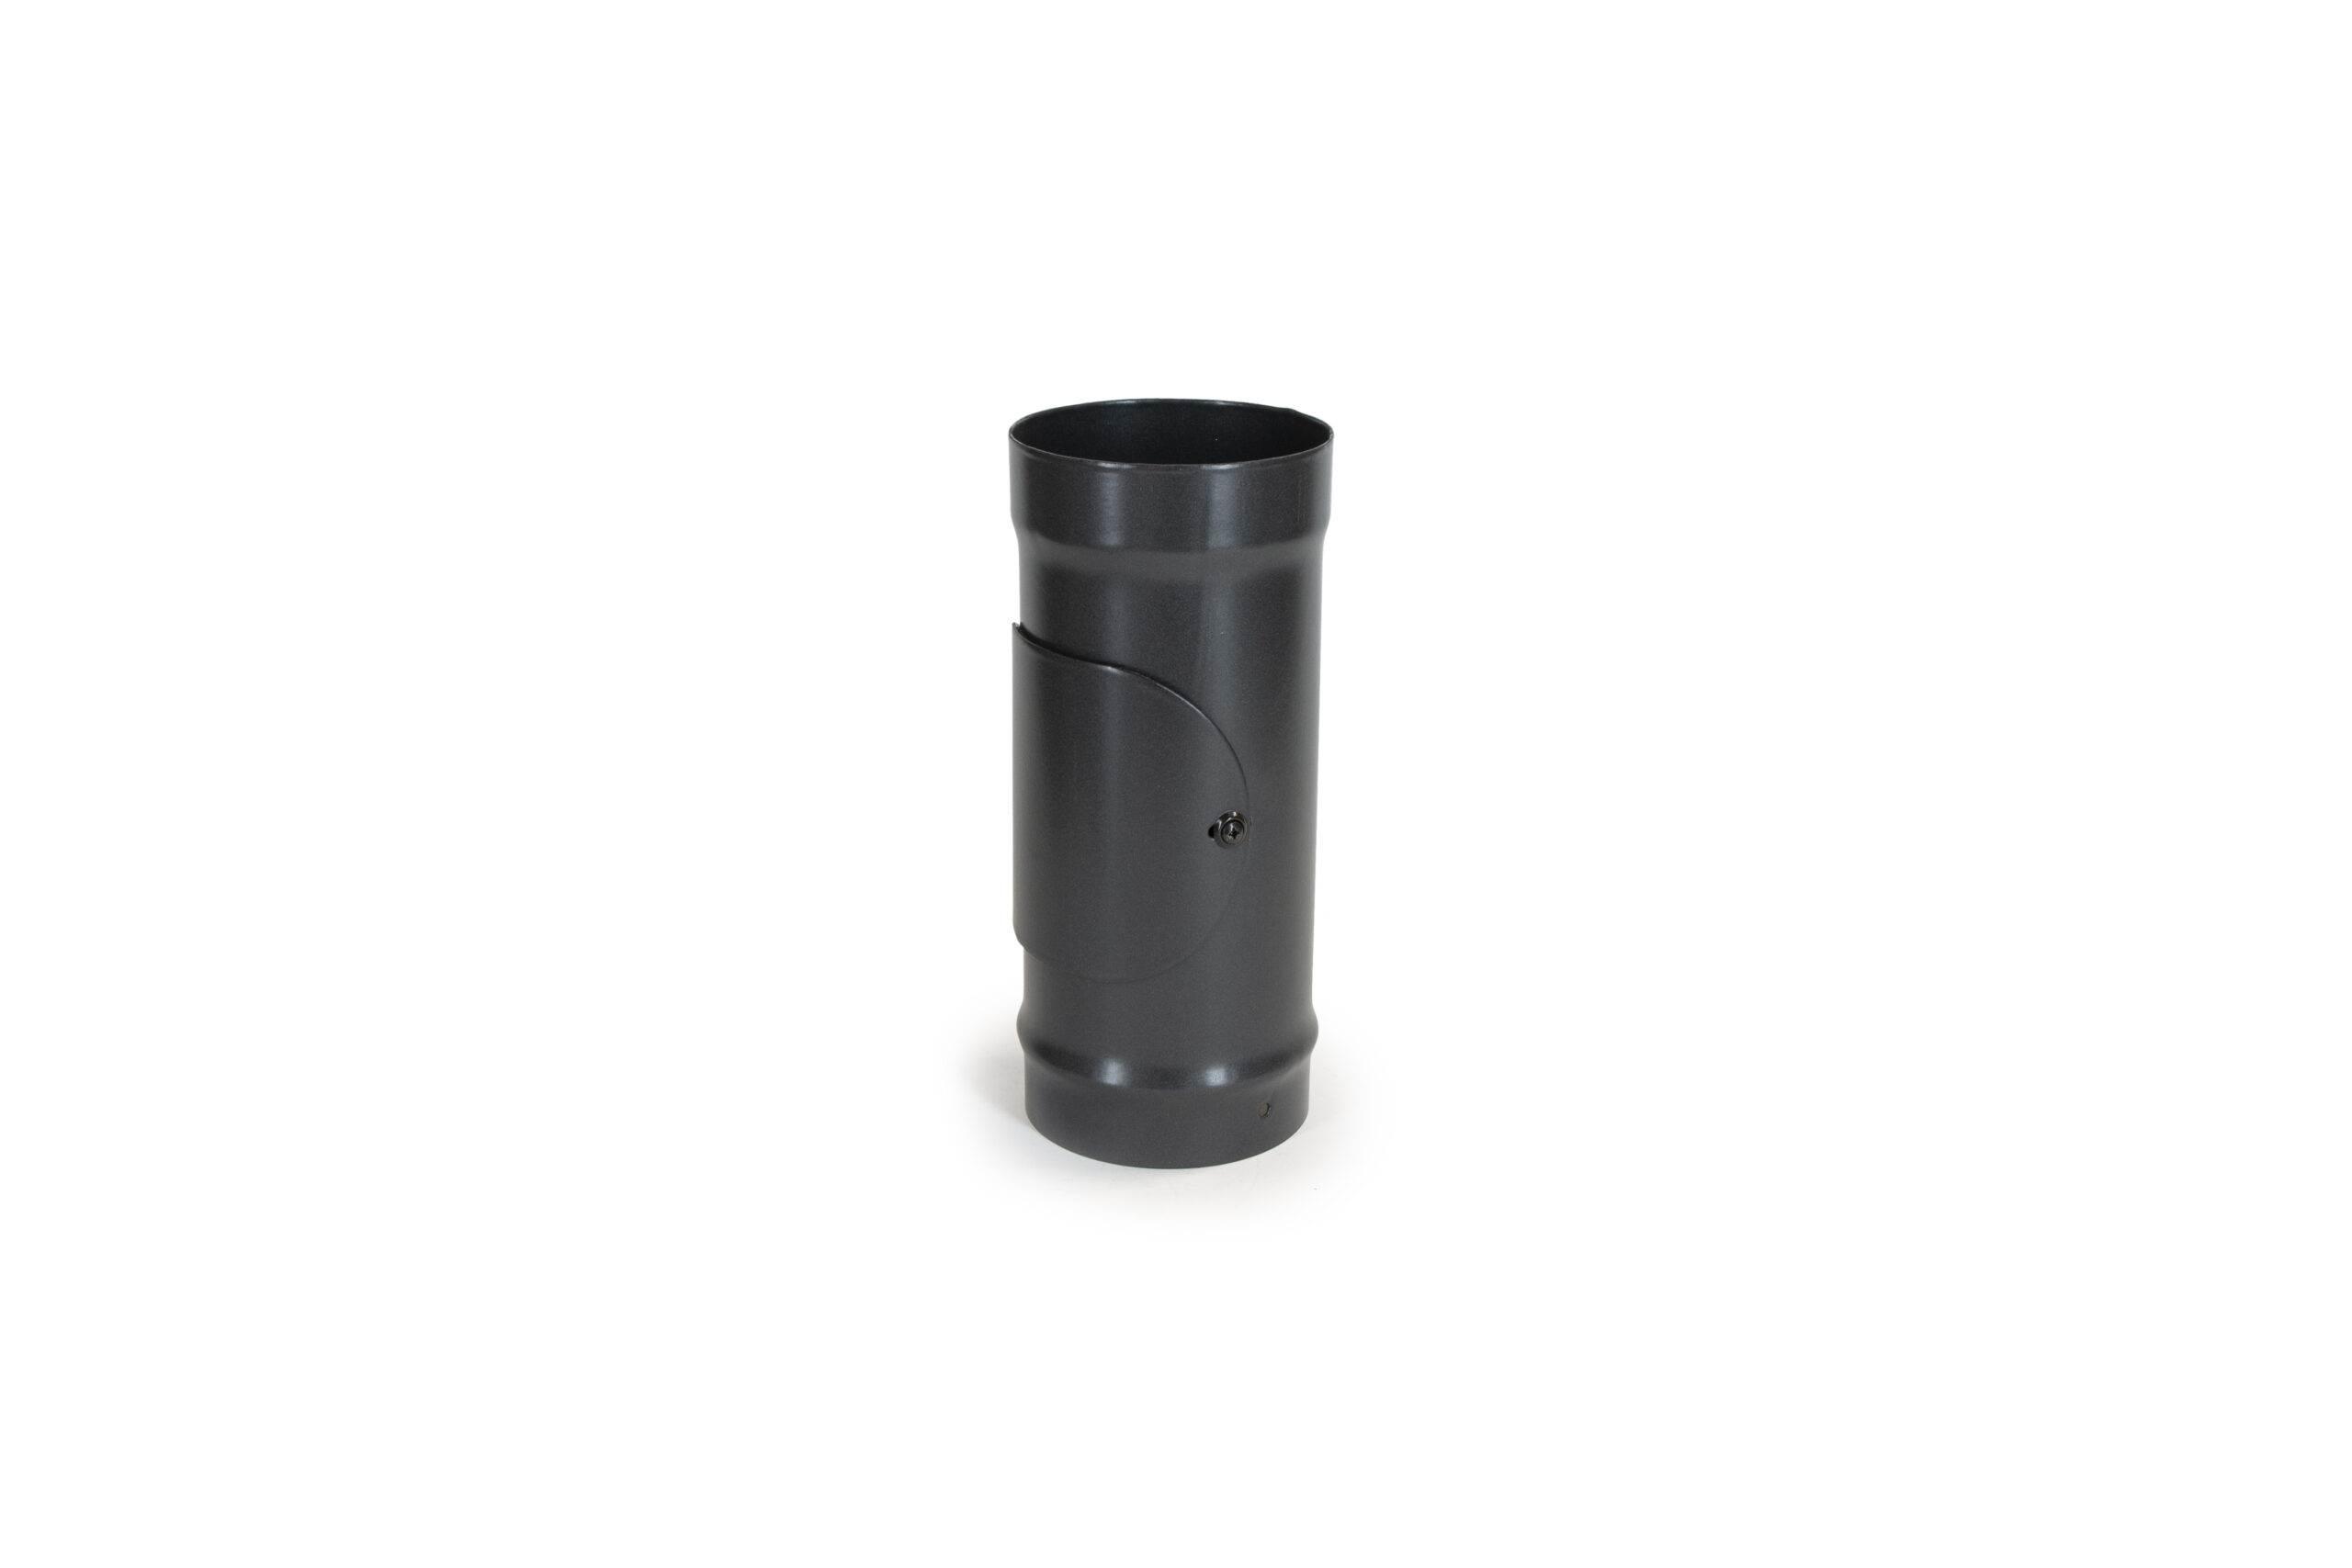 300mm (1ft) Pipe with Access Door - Vitreous Enamel Flue Pipe - Matt Black